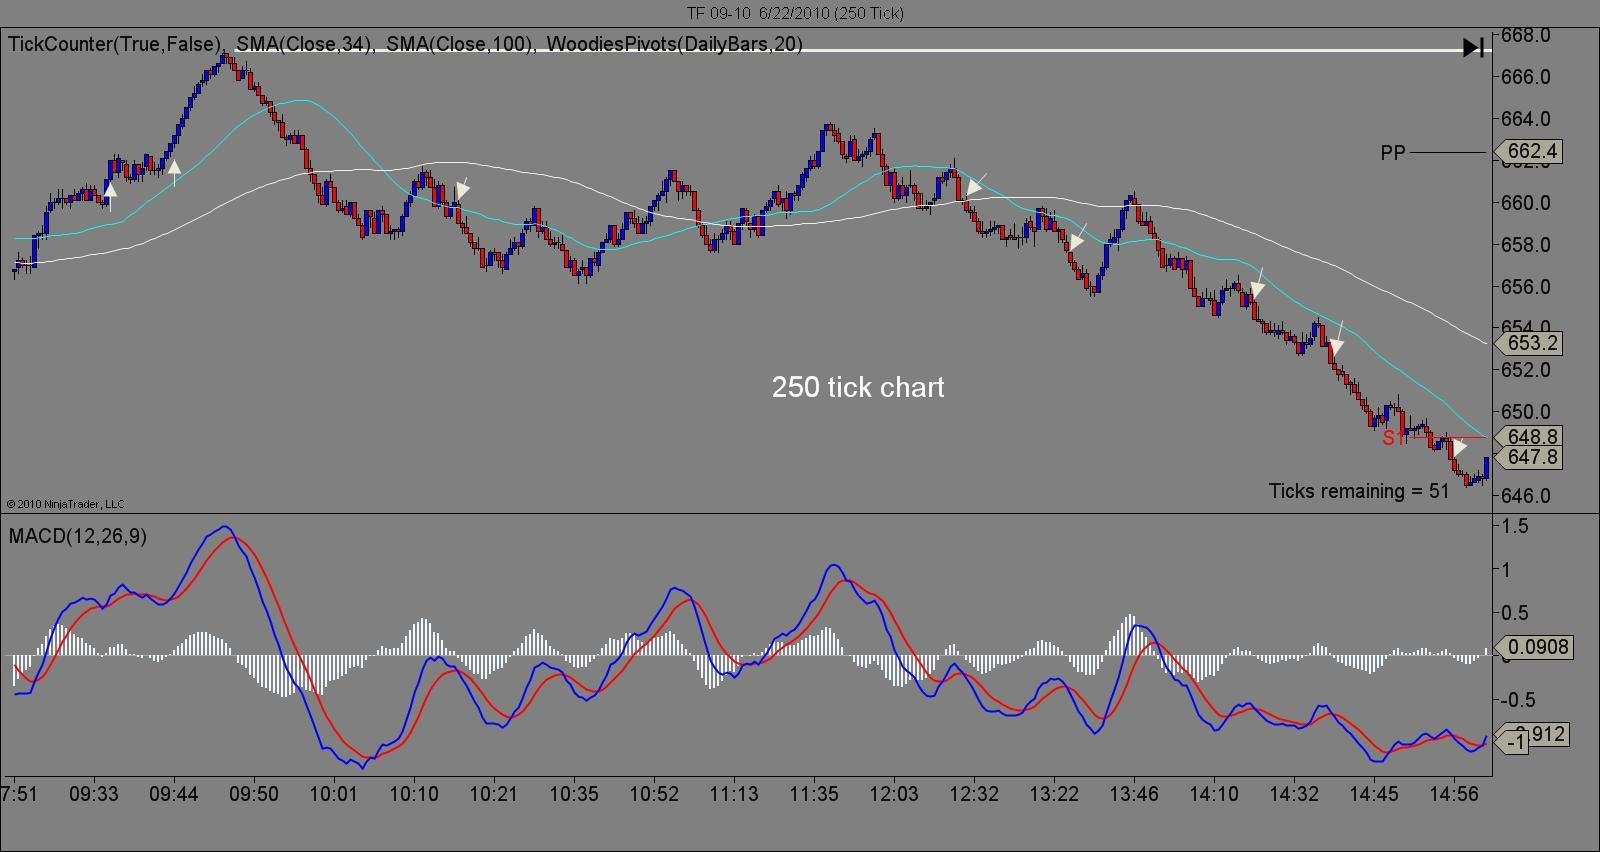 250 tick chart